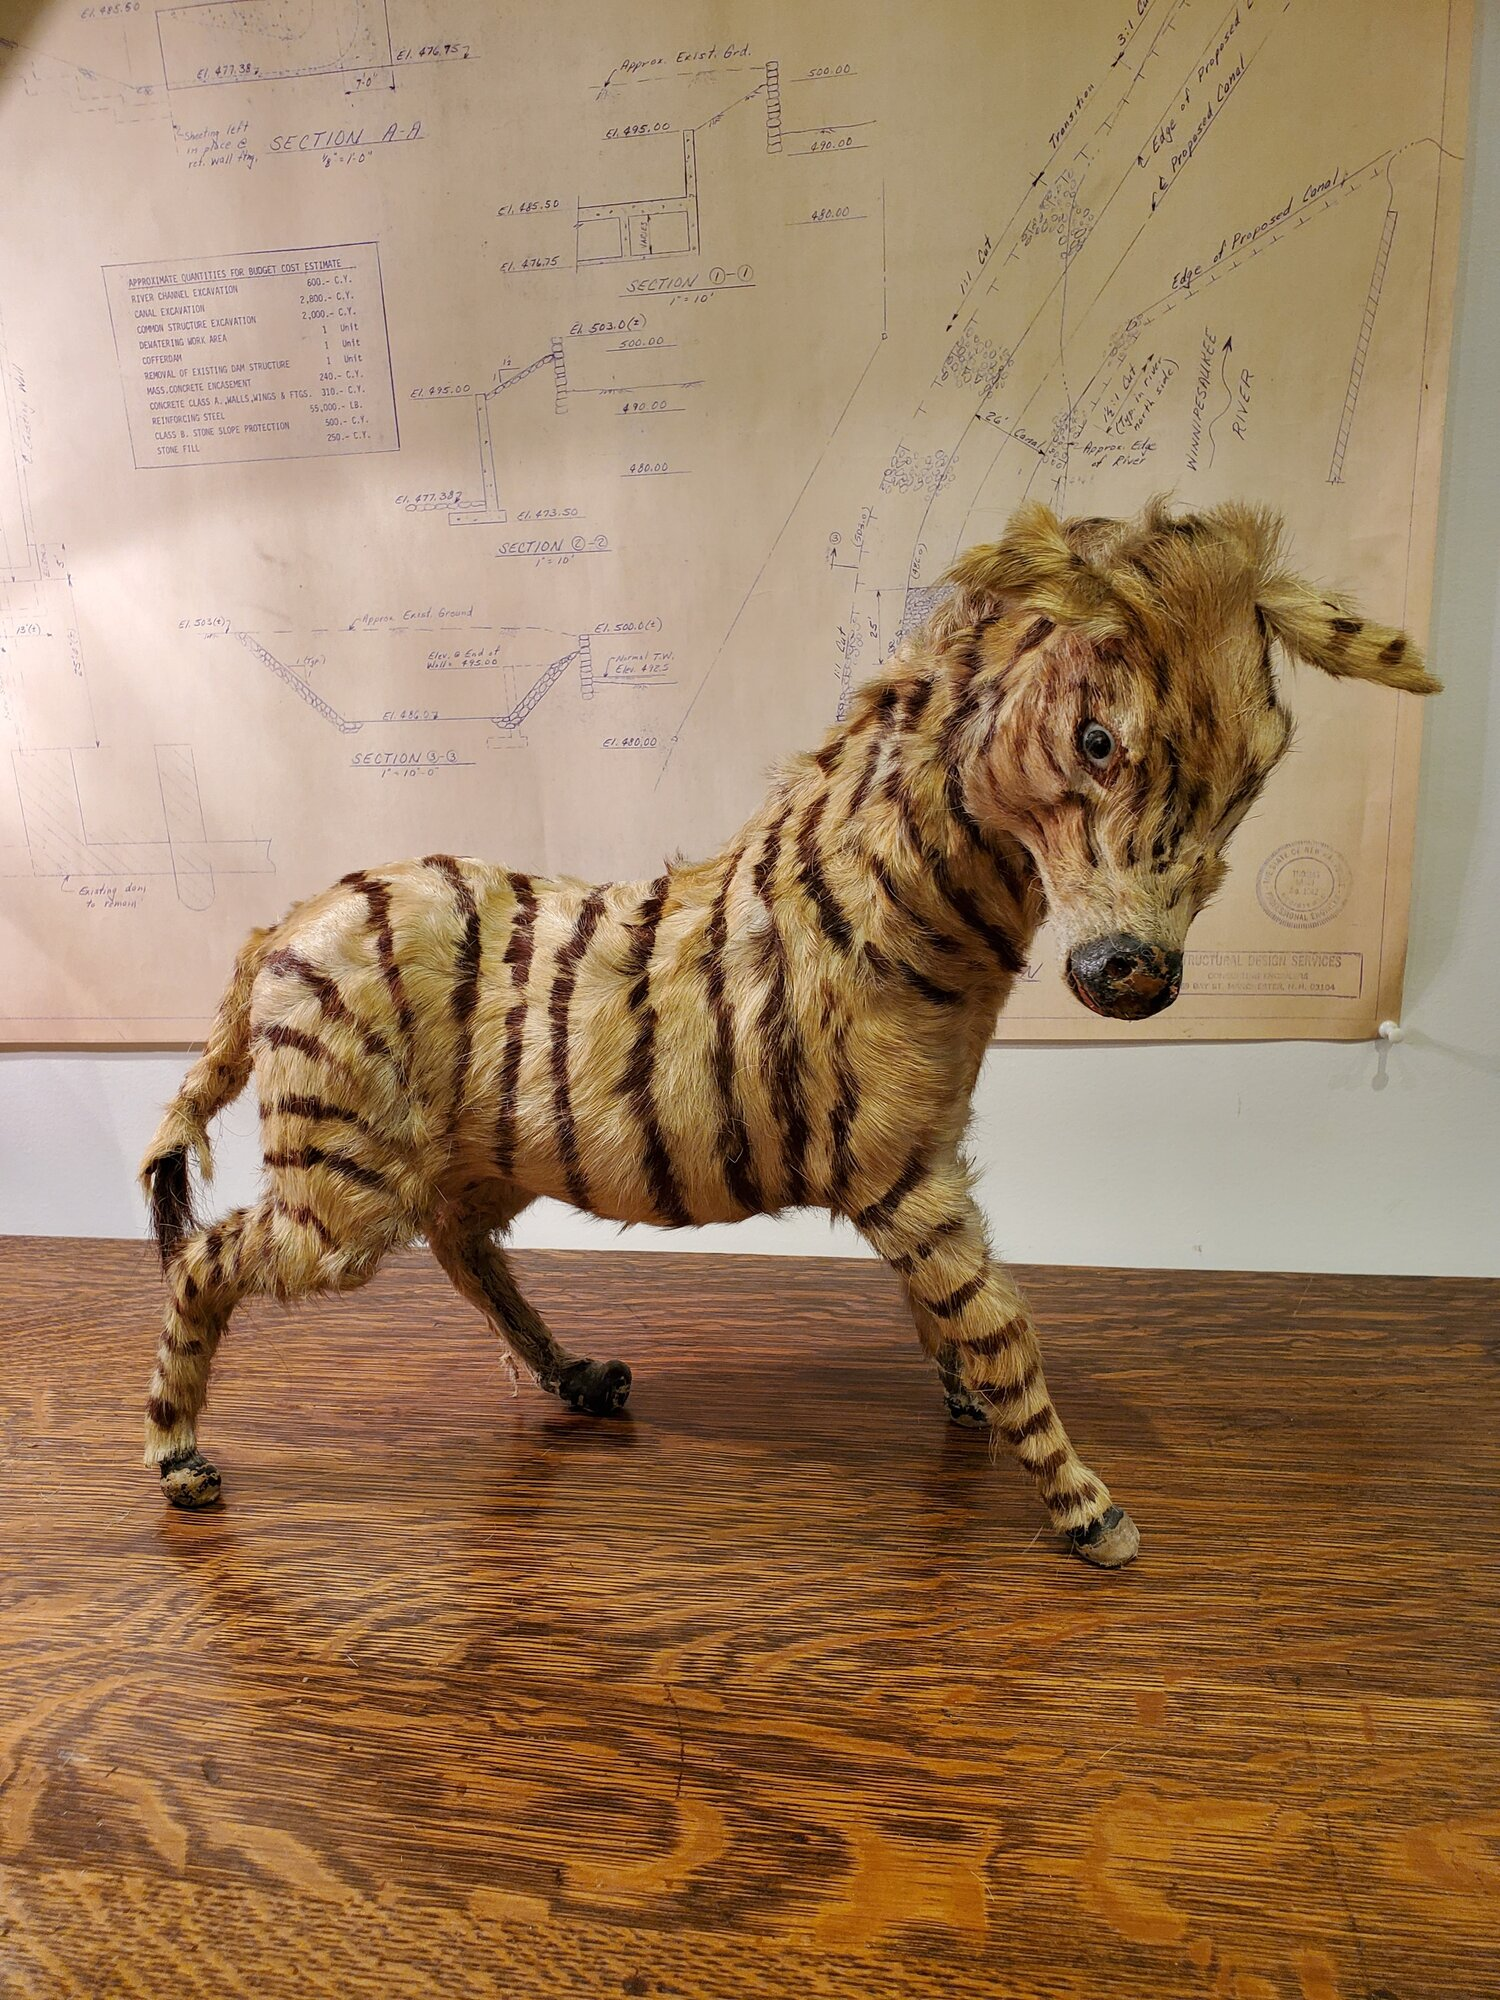 Zebra Design Butée de Porte Animal Fourrure porte accessoires Home Decor 20x15x15cm